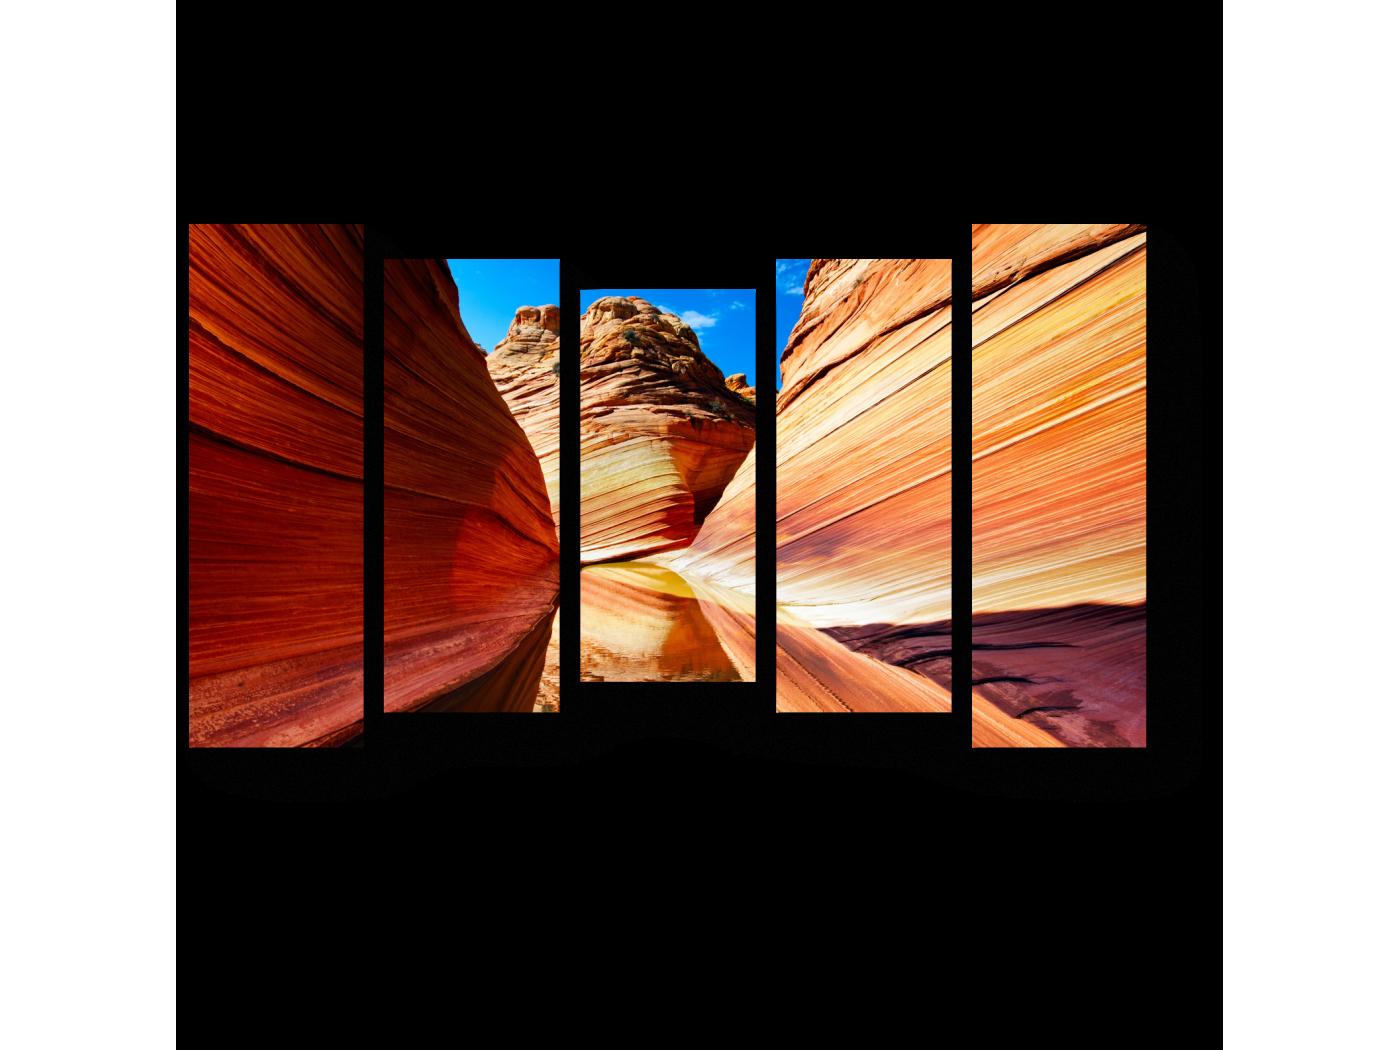 Модульная картина Каньон в лучах солнца (90x54) фото